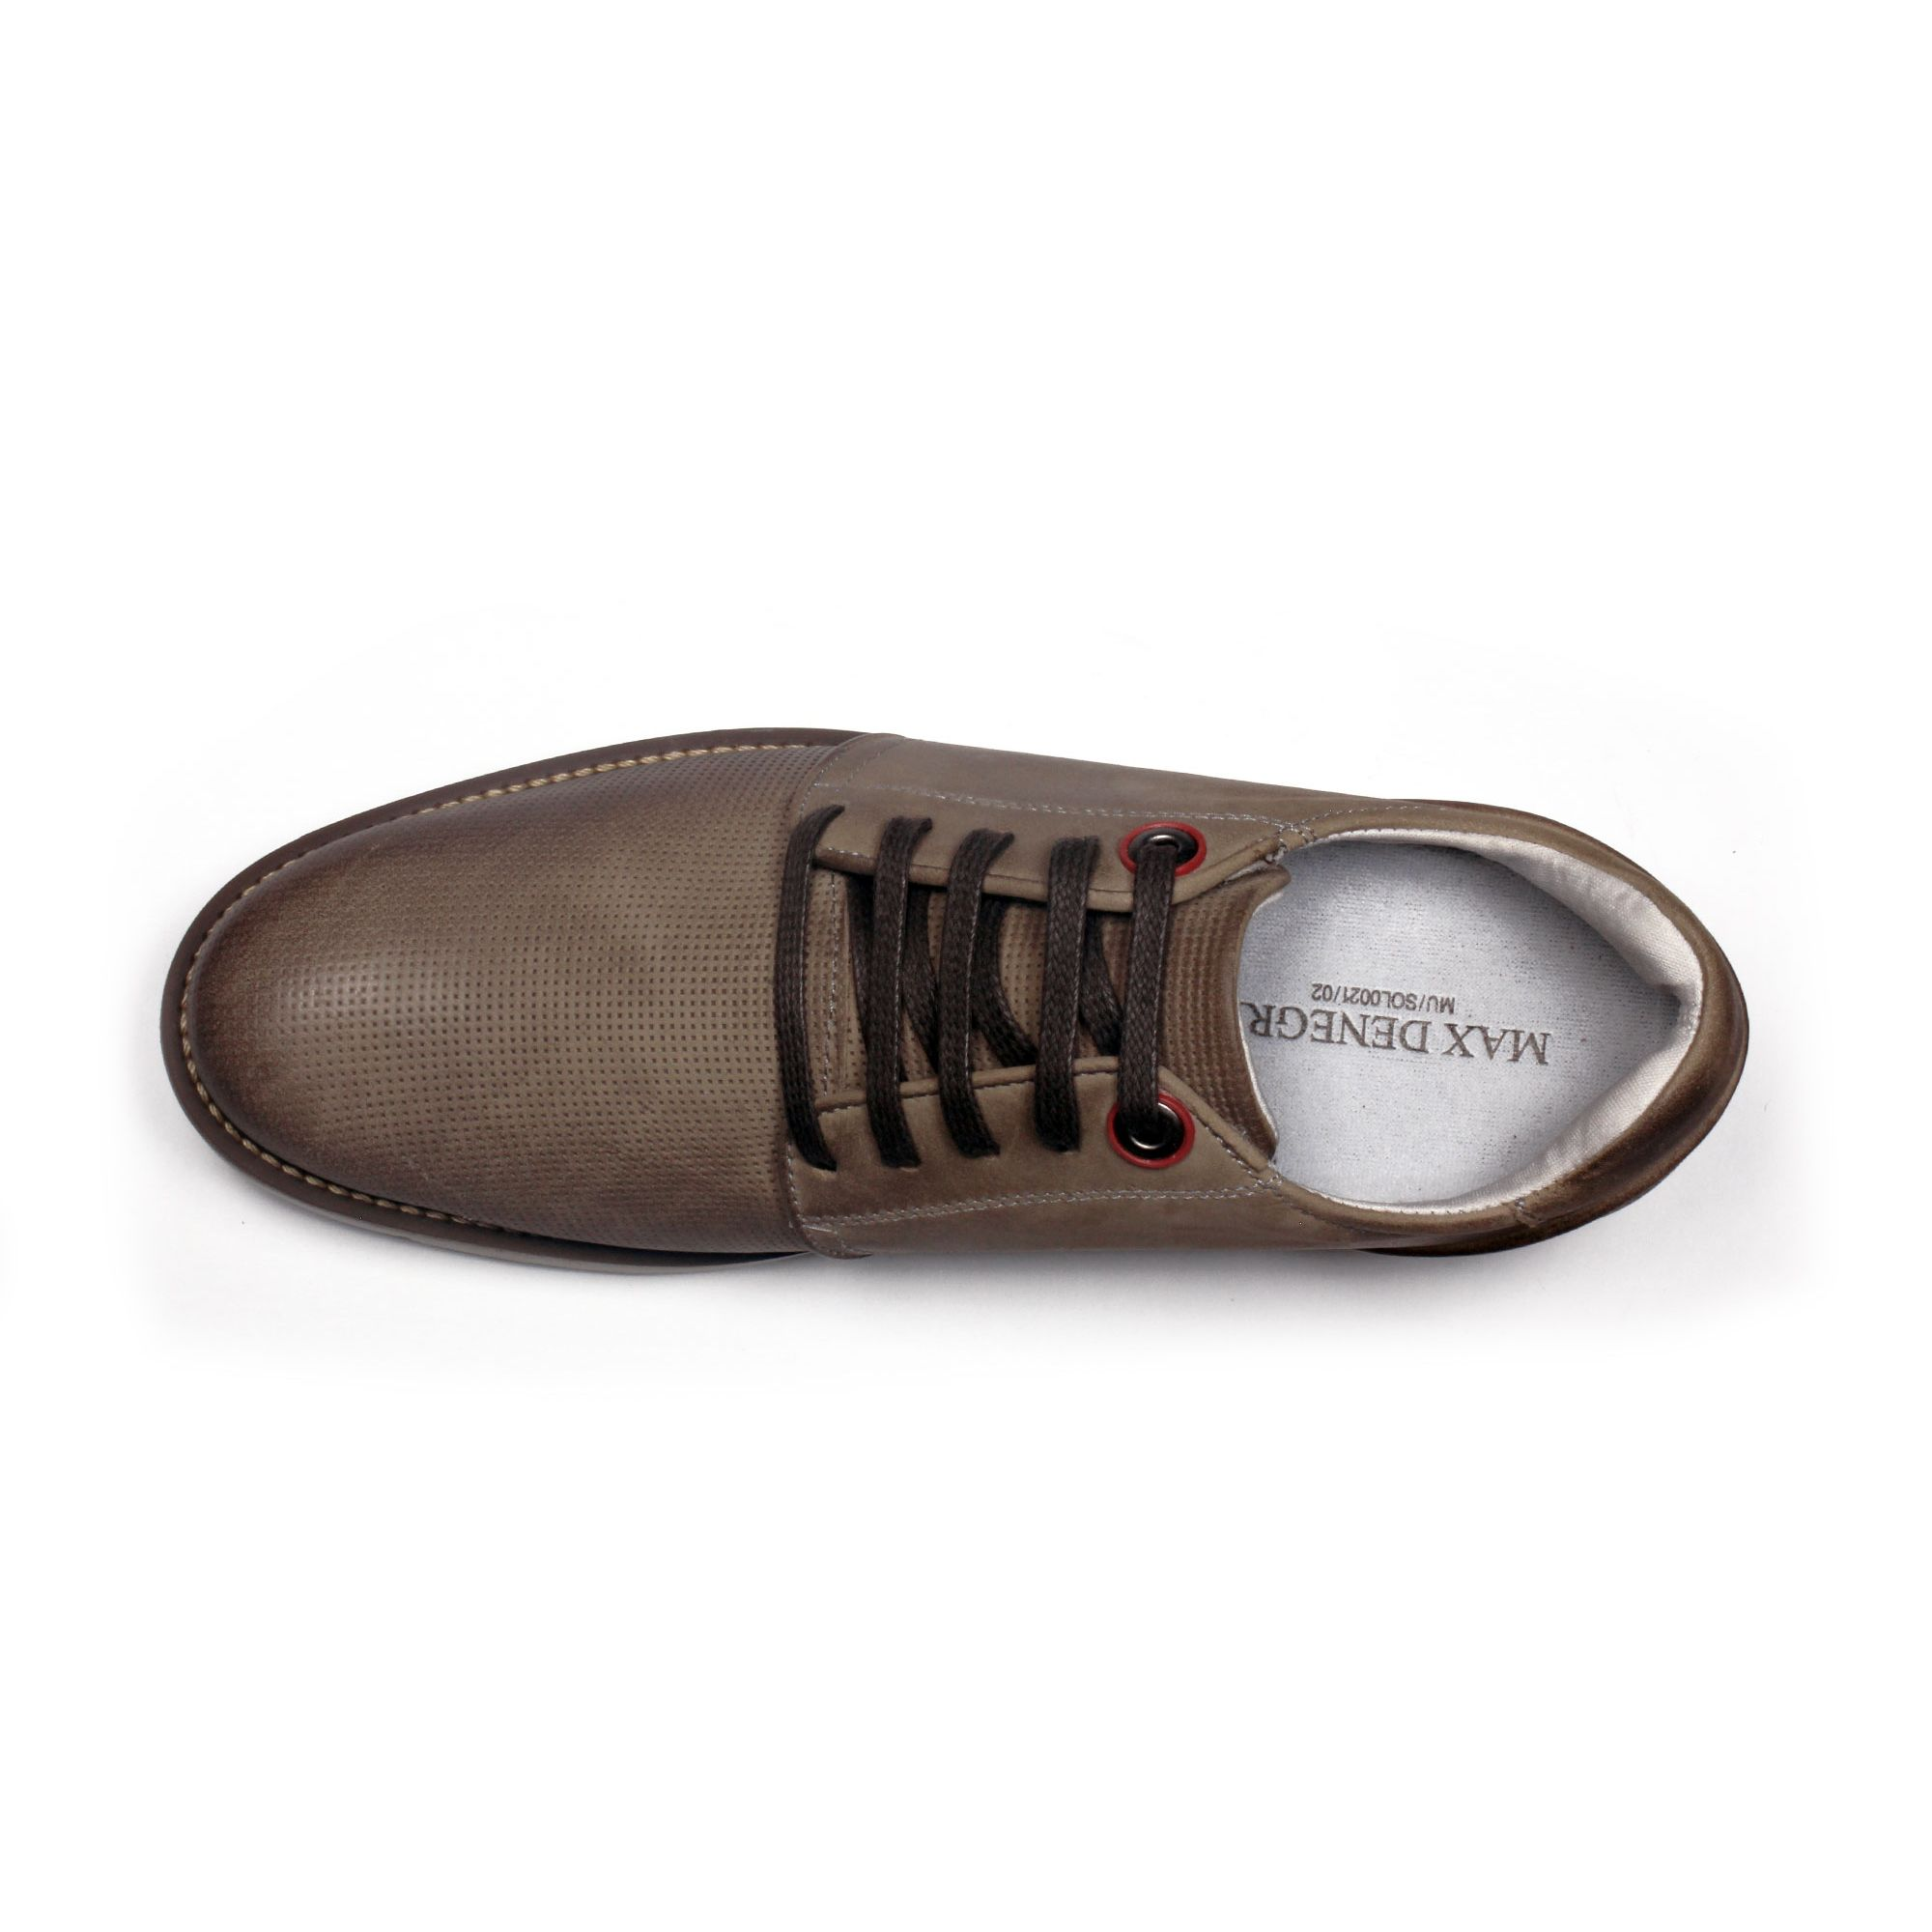 Zapato Casual Avenue Gris Max Denegri +7cms de Altura_70863